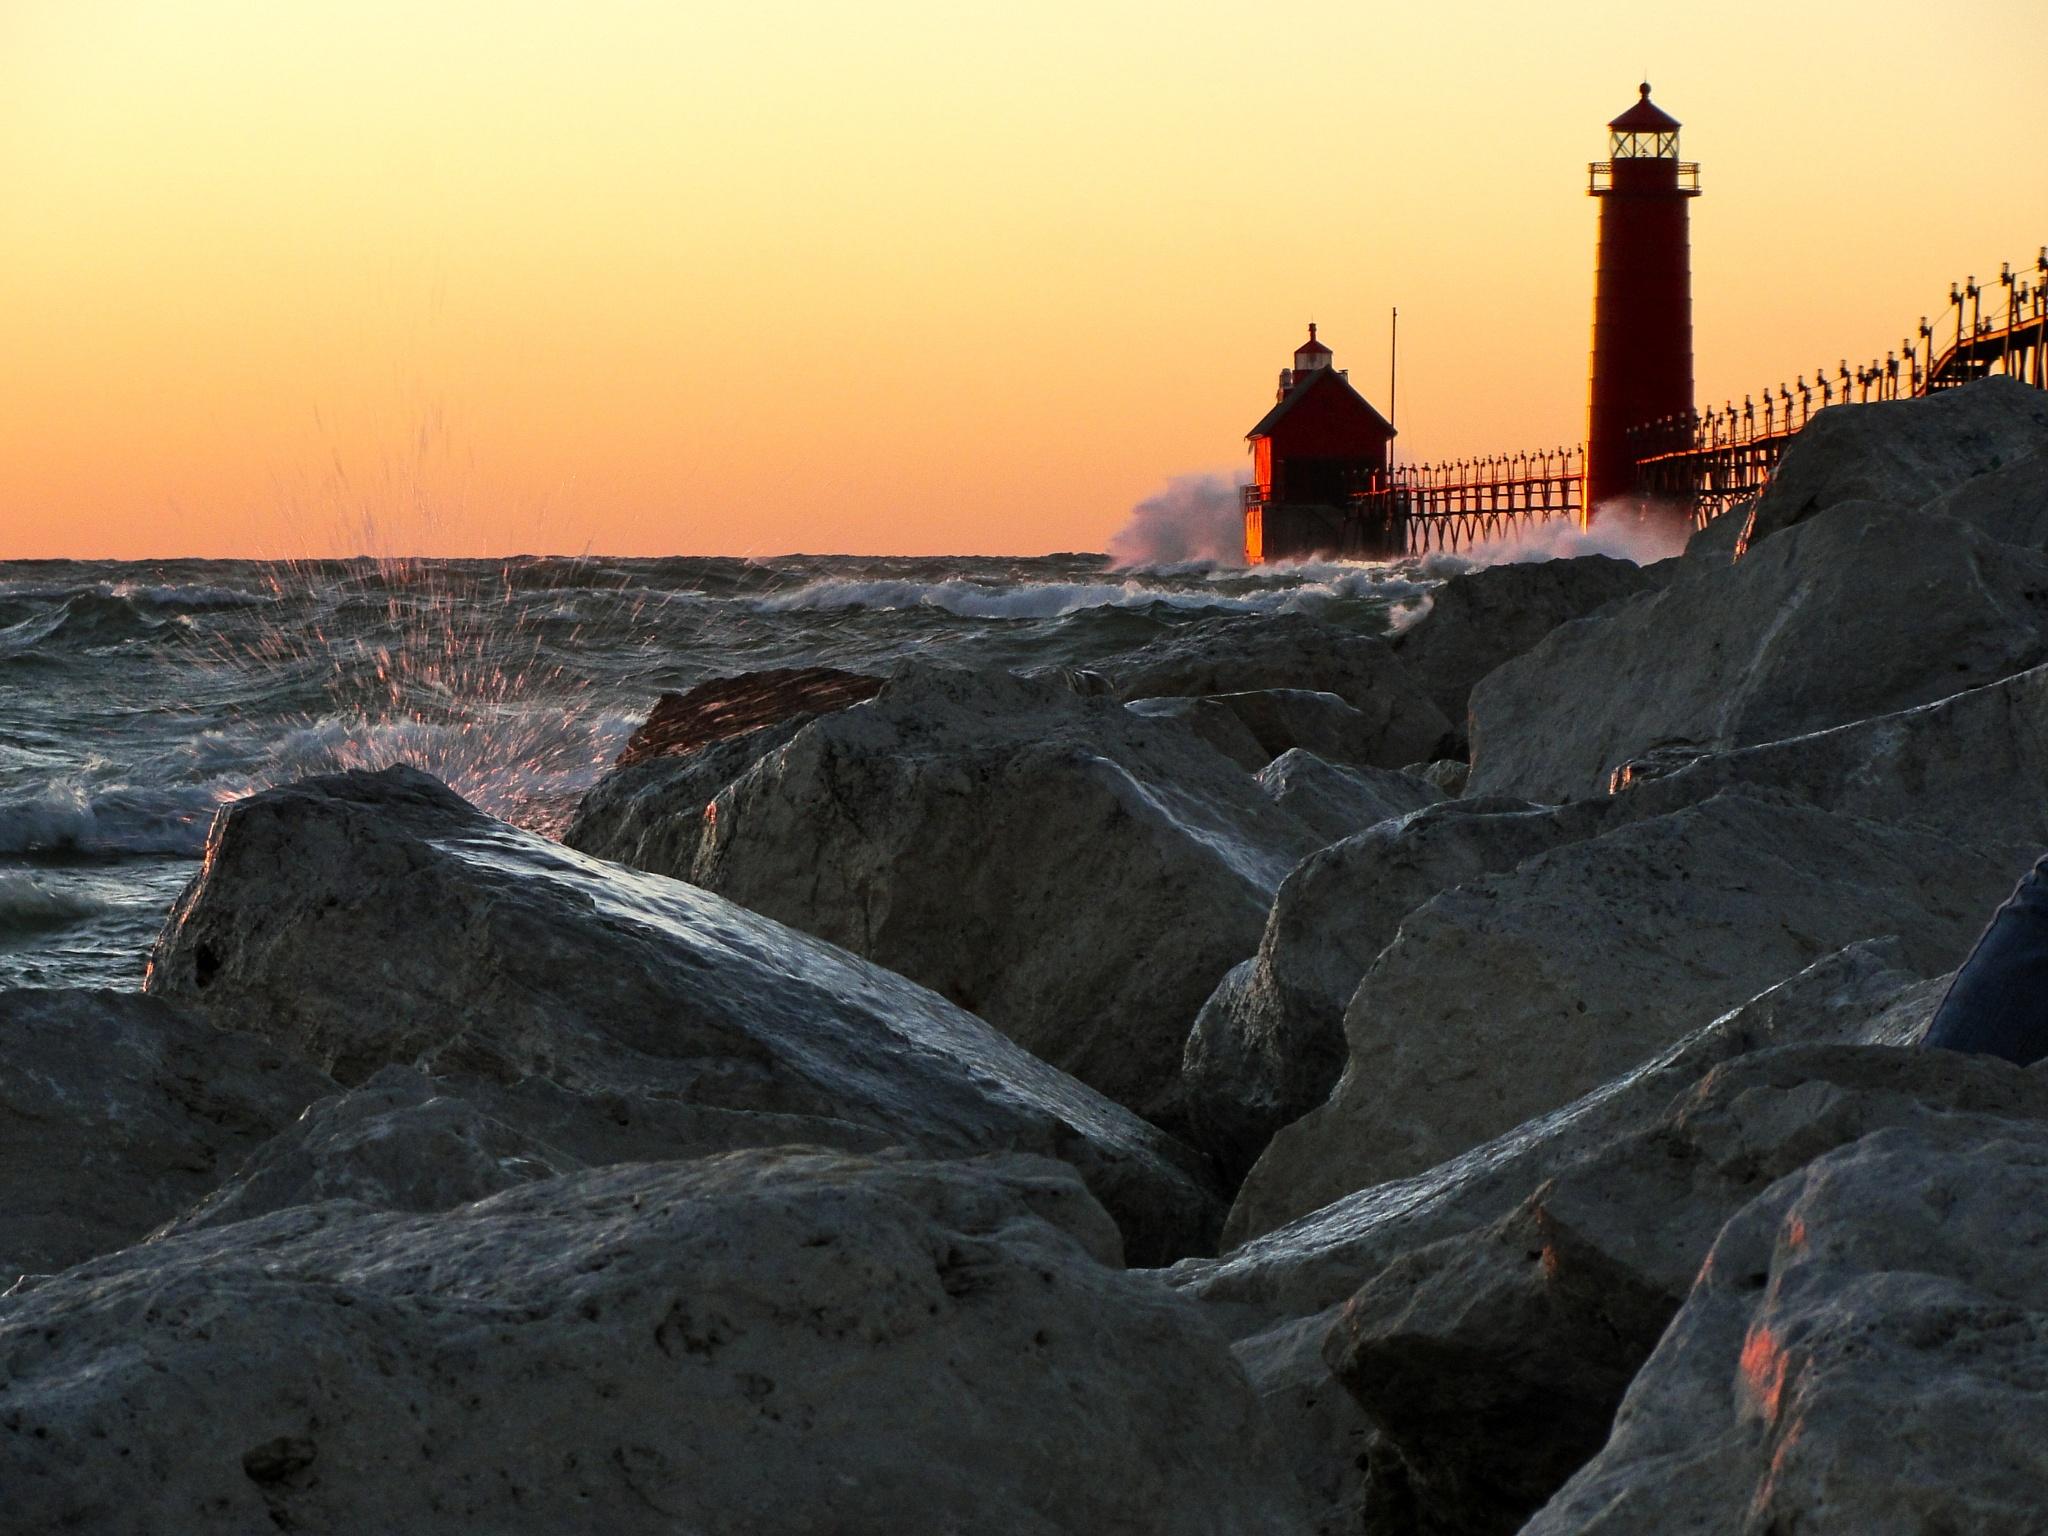 sunset lake michigan by John  Lepisto